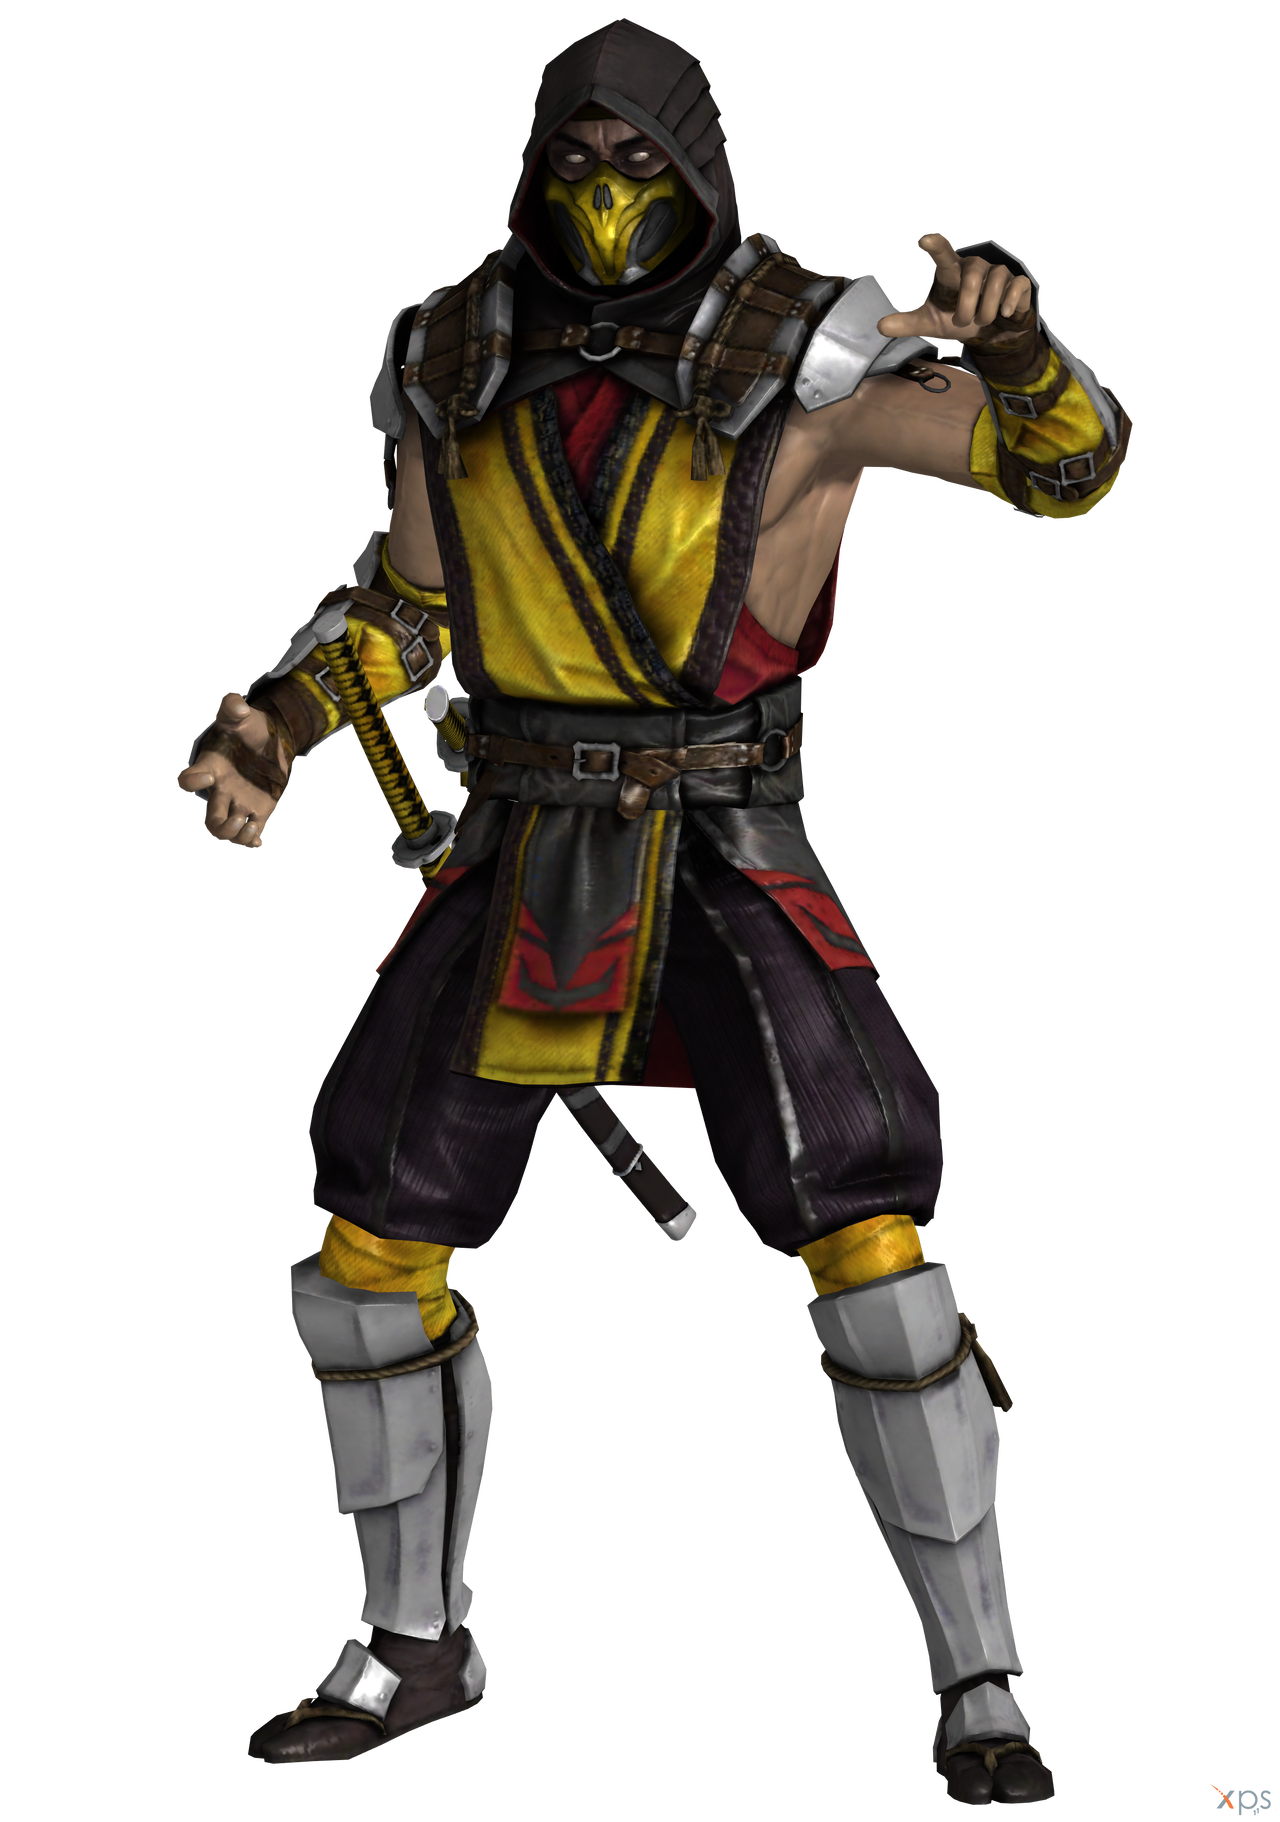 Scorpion Personajes De Mortal Kombat Imagenes De Mortal Kombat Arte Kombat Mortal